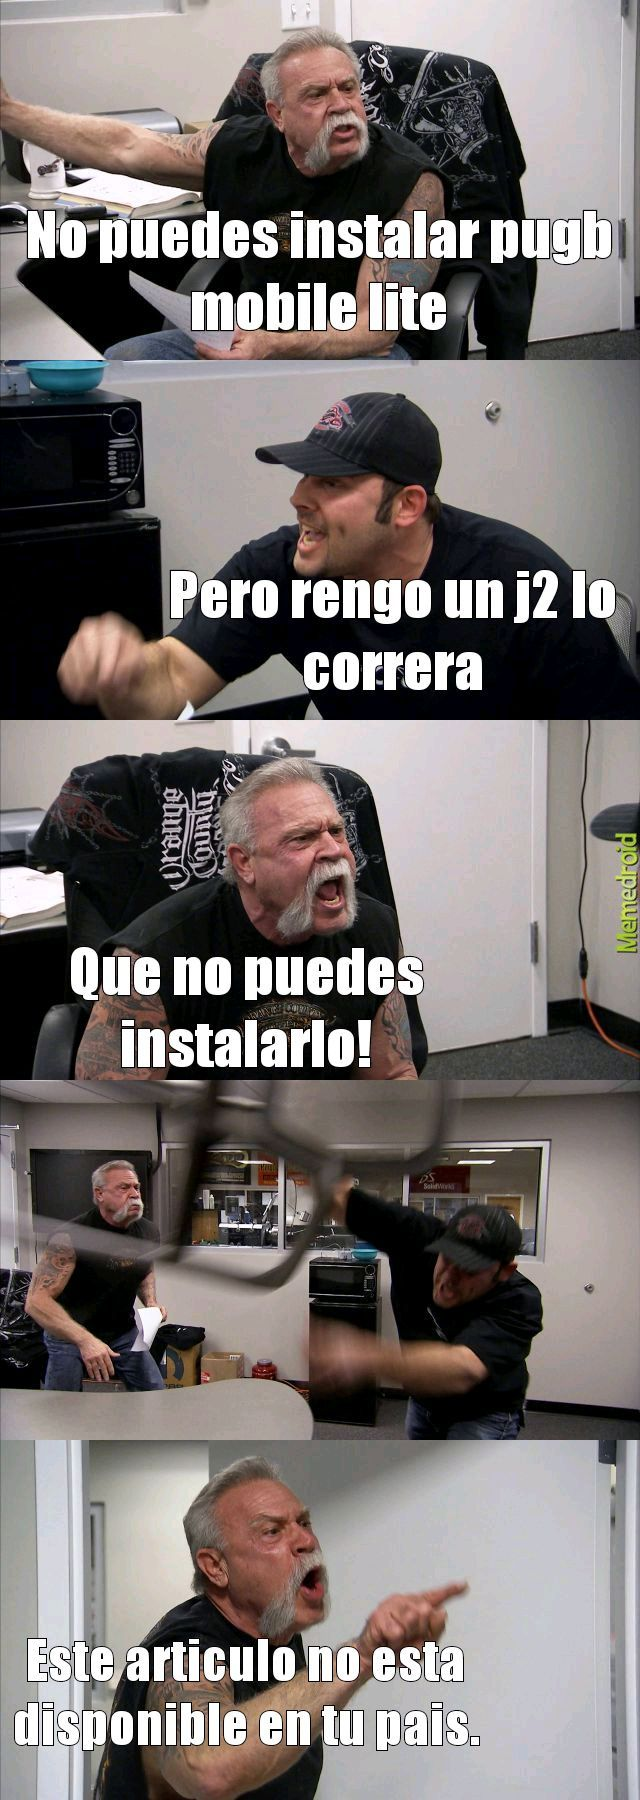 Latinoamerca mi hogar. - meme